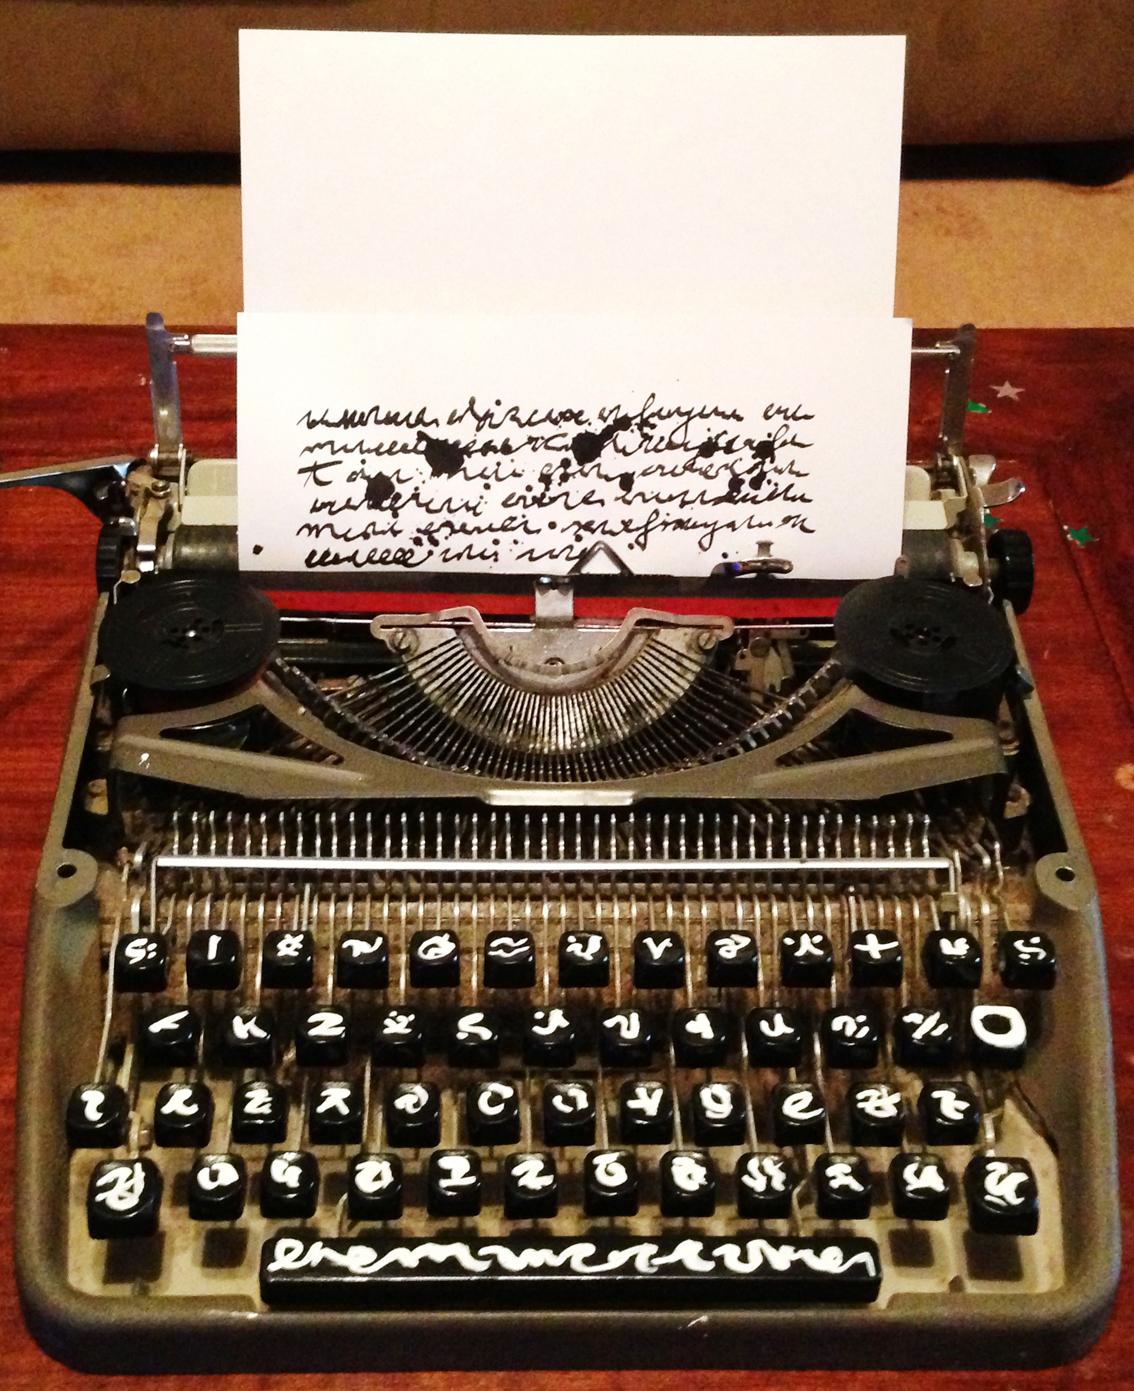 11 - Charles Olson's Typewriter